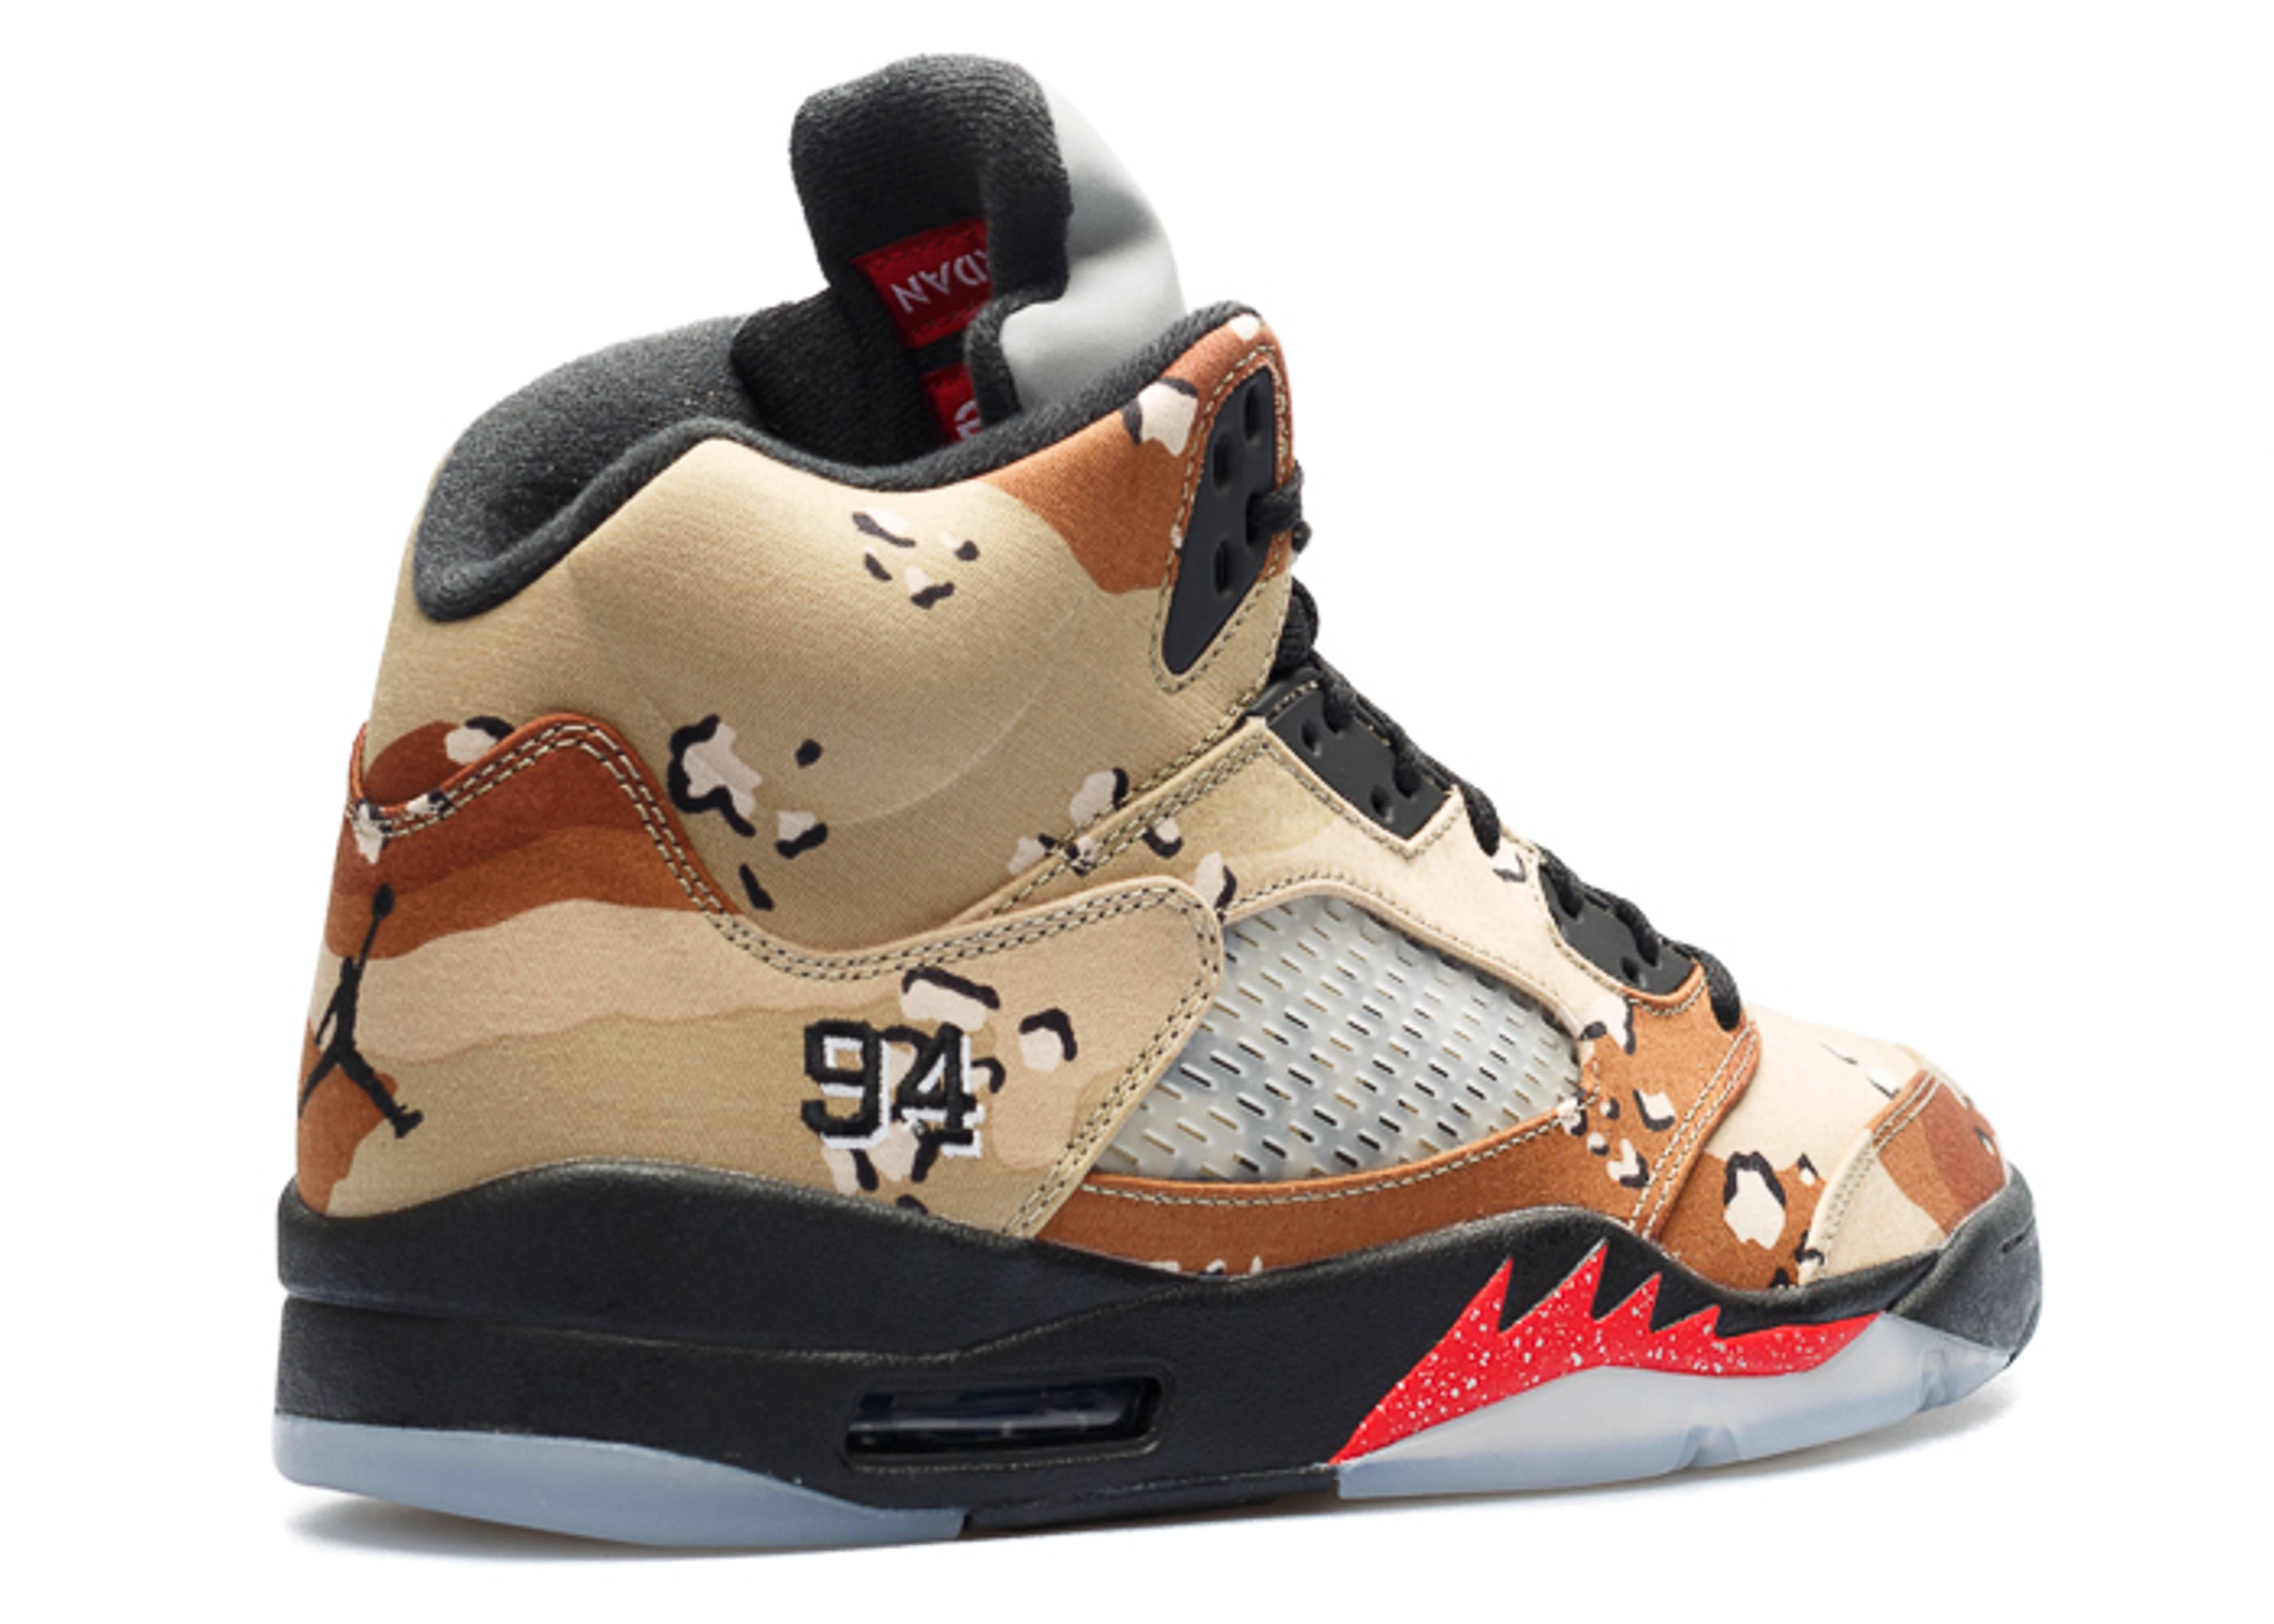 promo code c0d74 5e079 Air Jordan 5 Retro Supreme